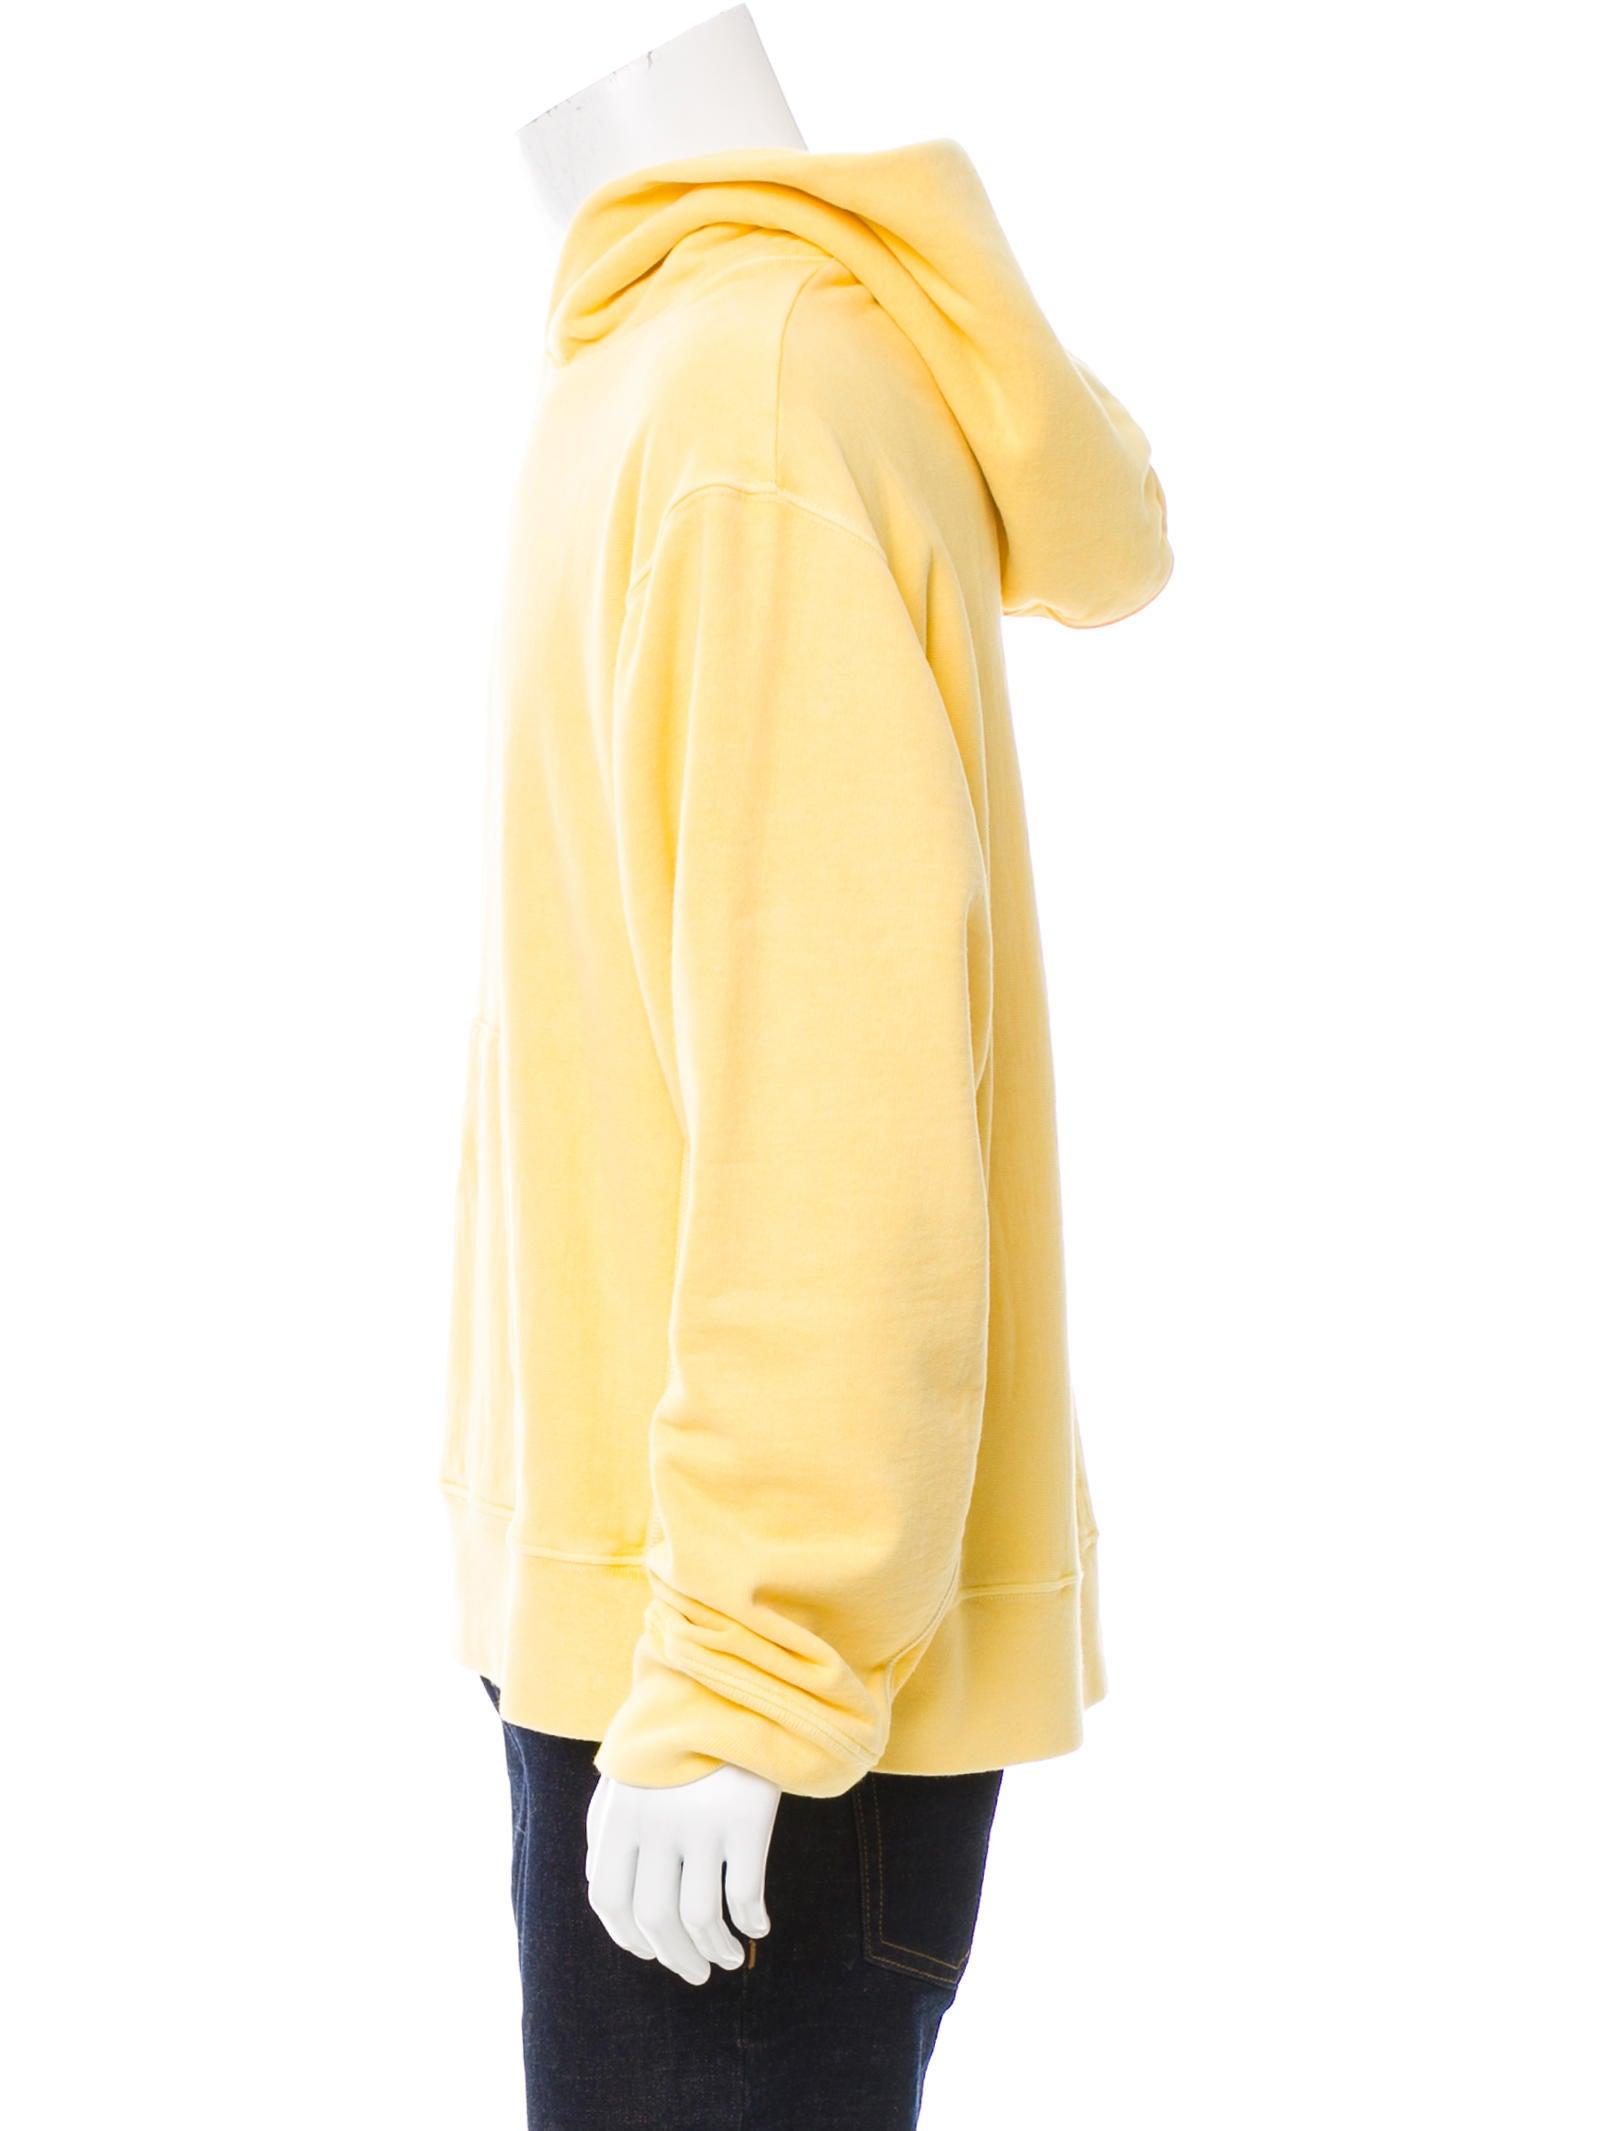 yeezy season 3 oversize sweatshirt clothing wyeez20523. Black Bedroom Furniture Sets. Home Design Ideas